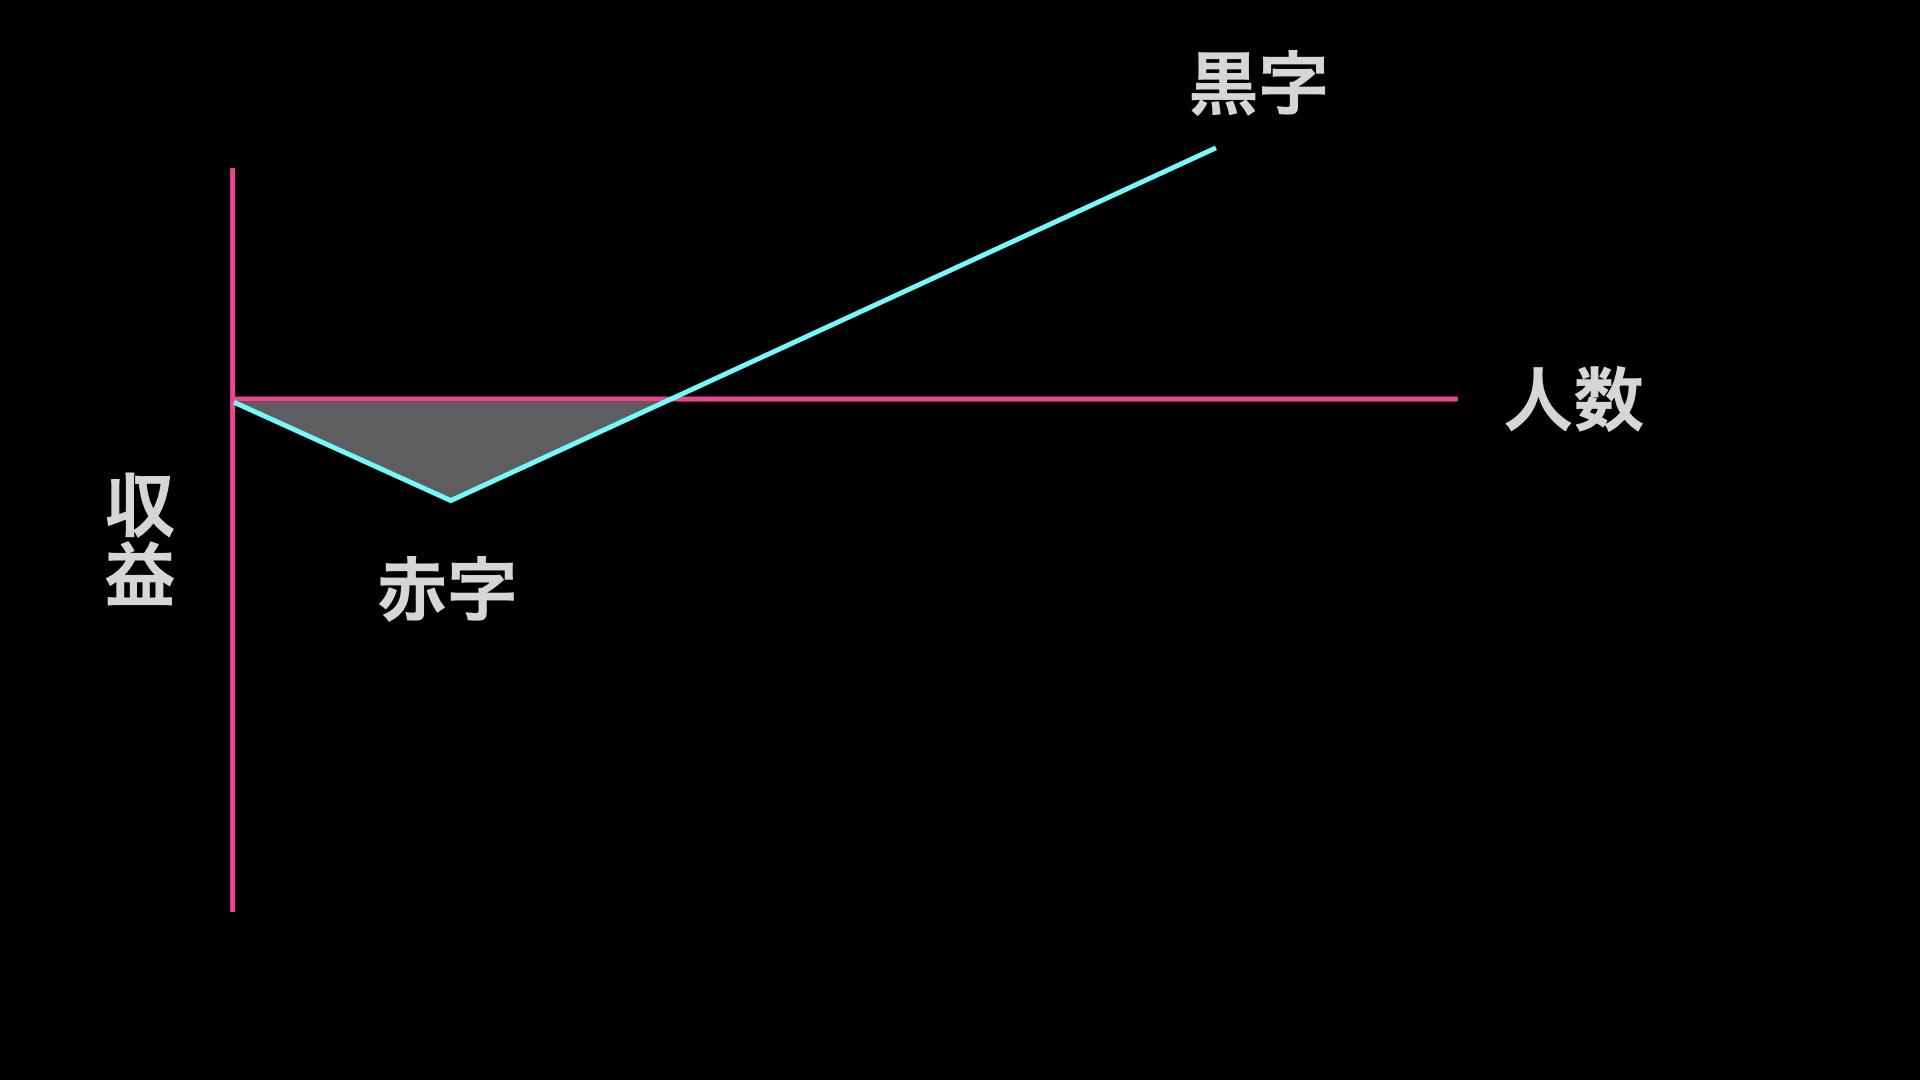 Freemium Modelの収入曲線